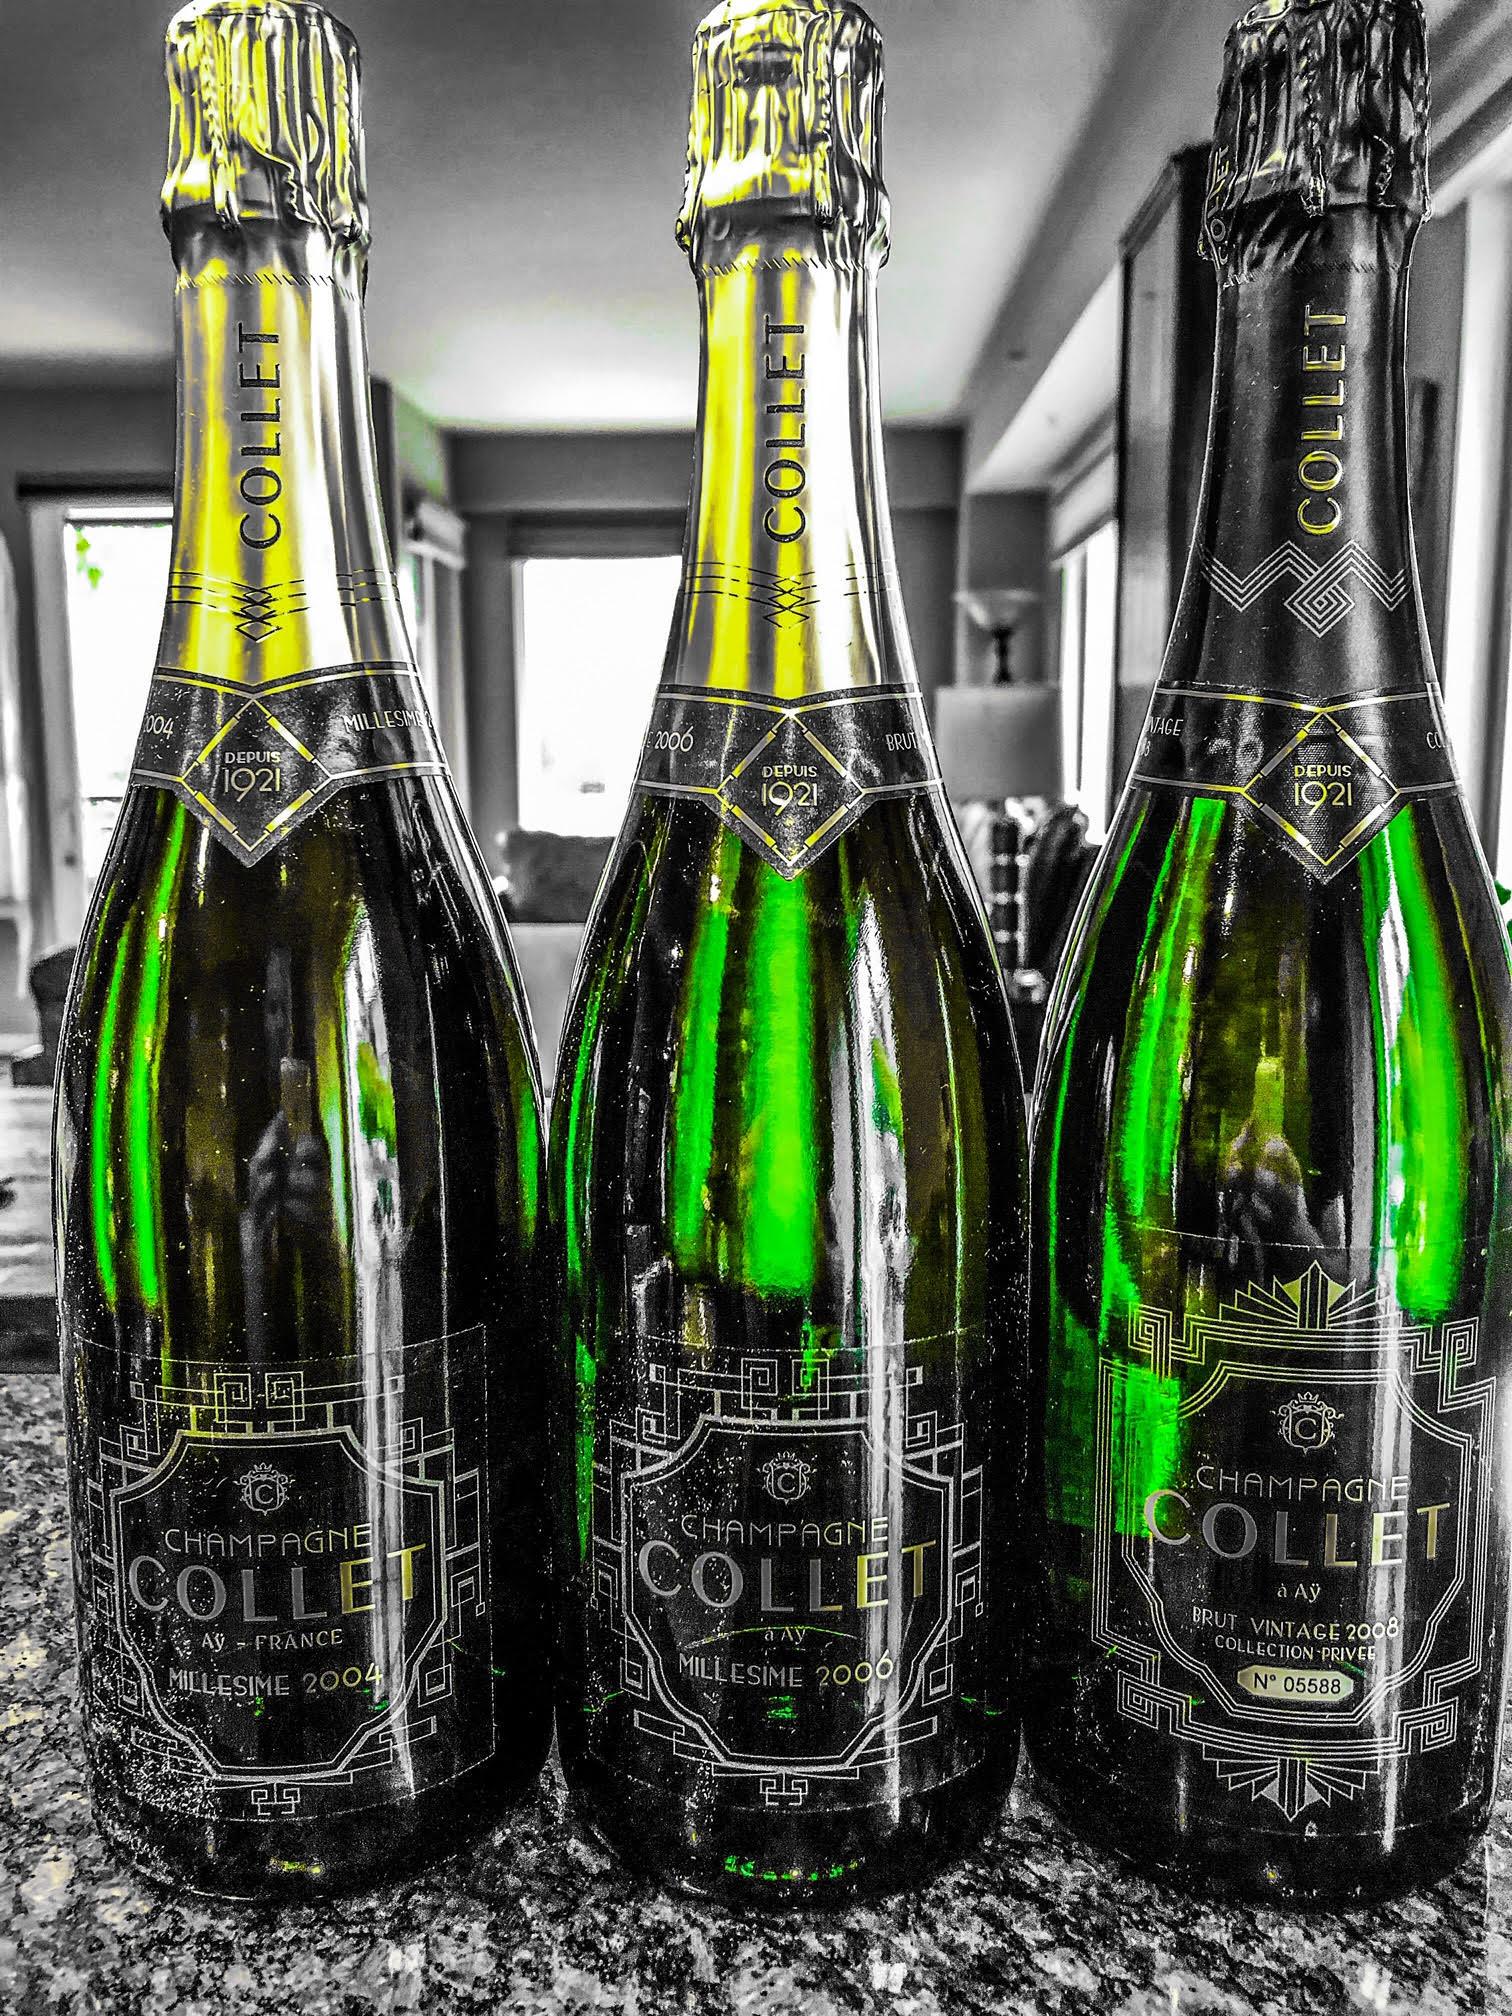 Champagne Collet 2004-2008 .jpg